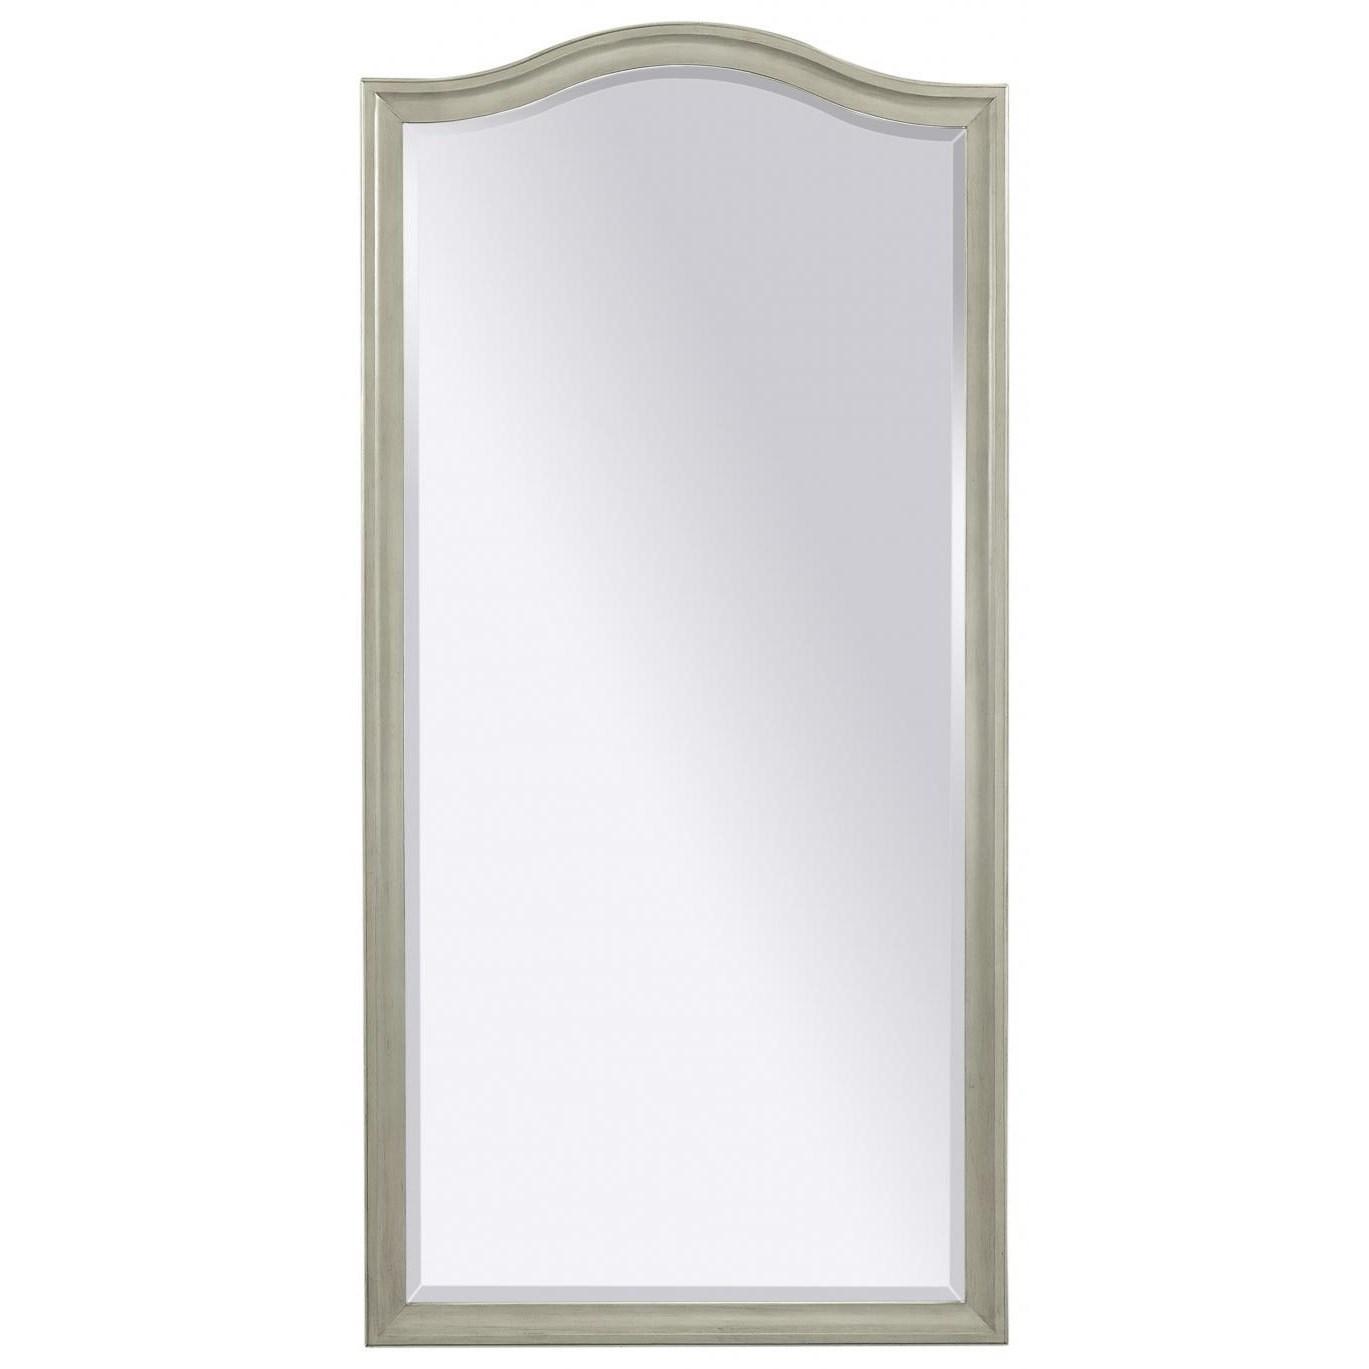 Charlotte  Floor Mirror by Aspenhome at Walker's Furniture